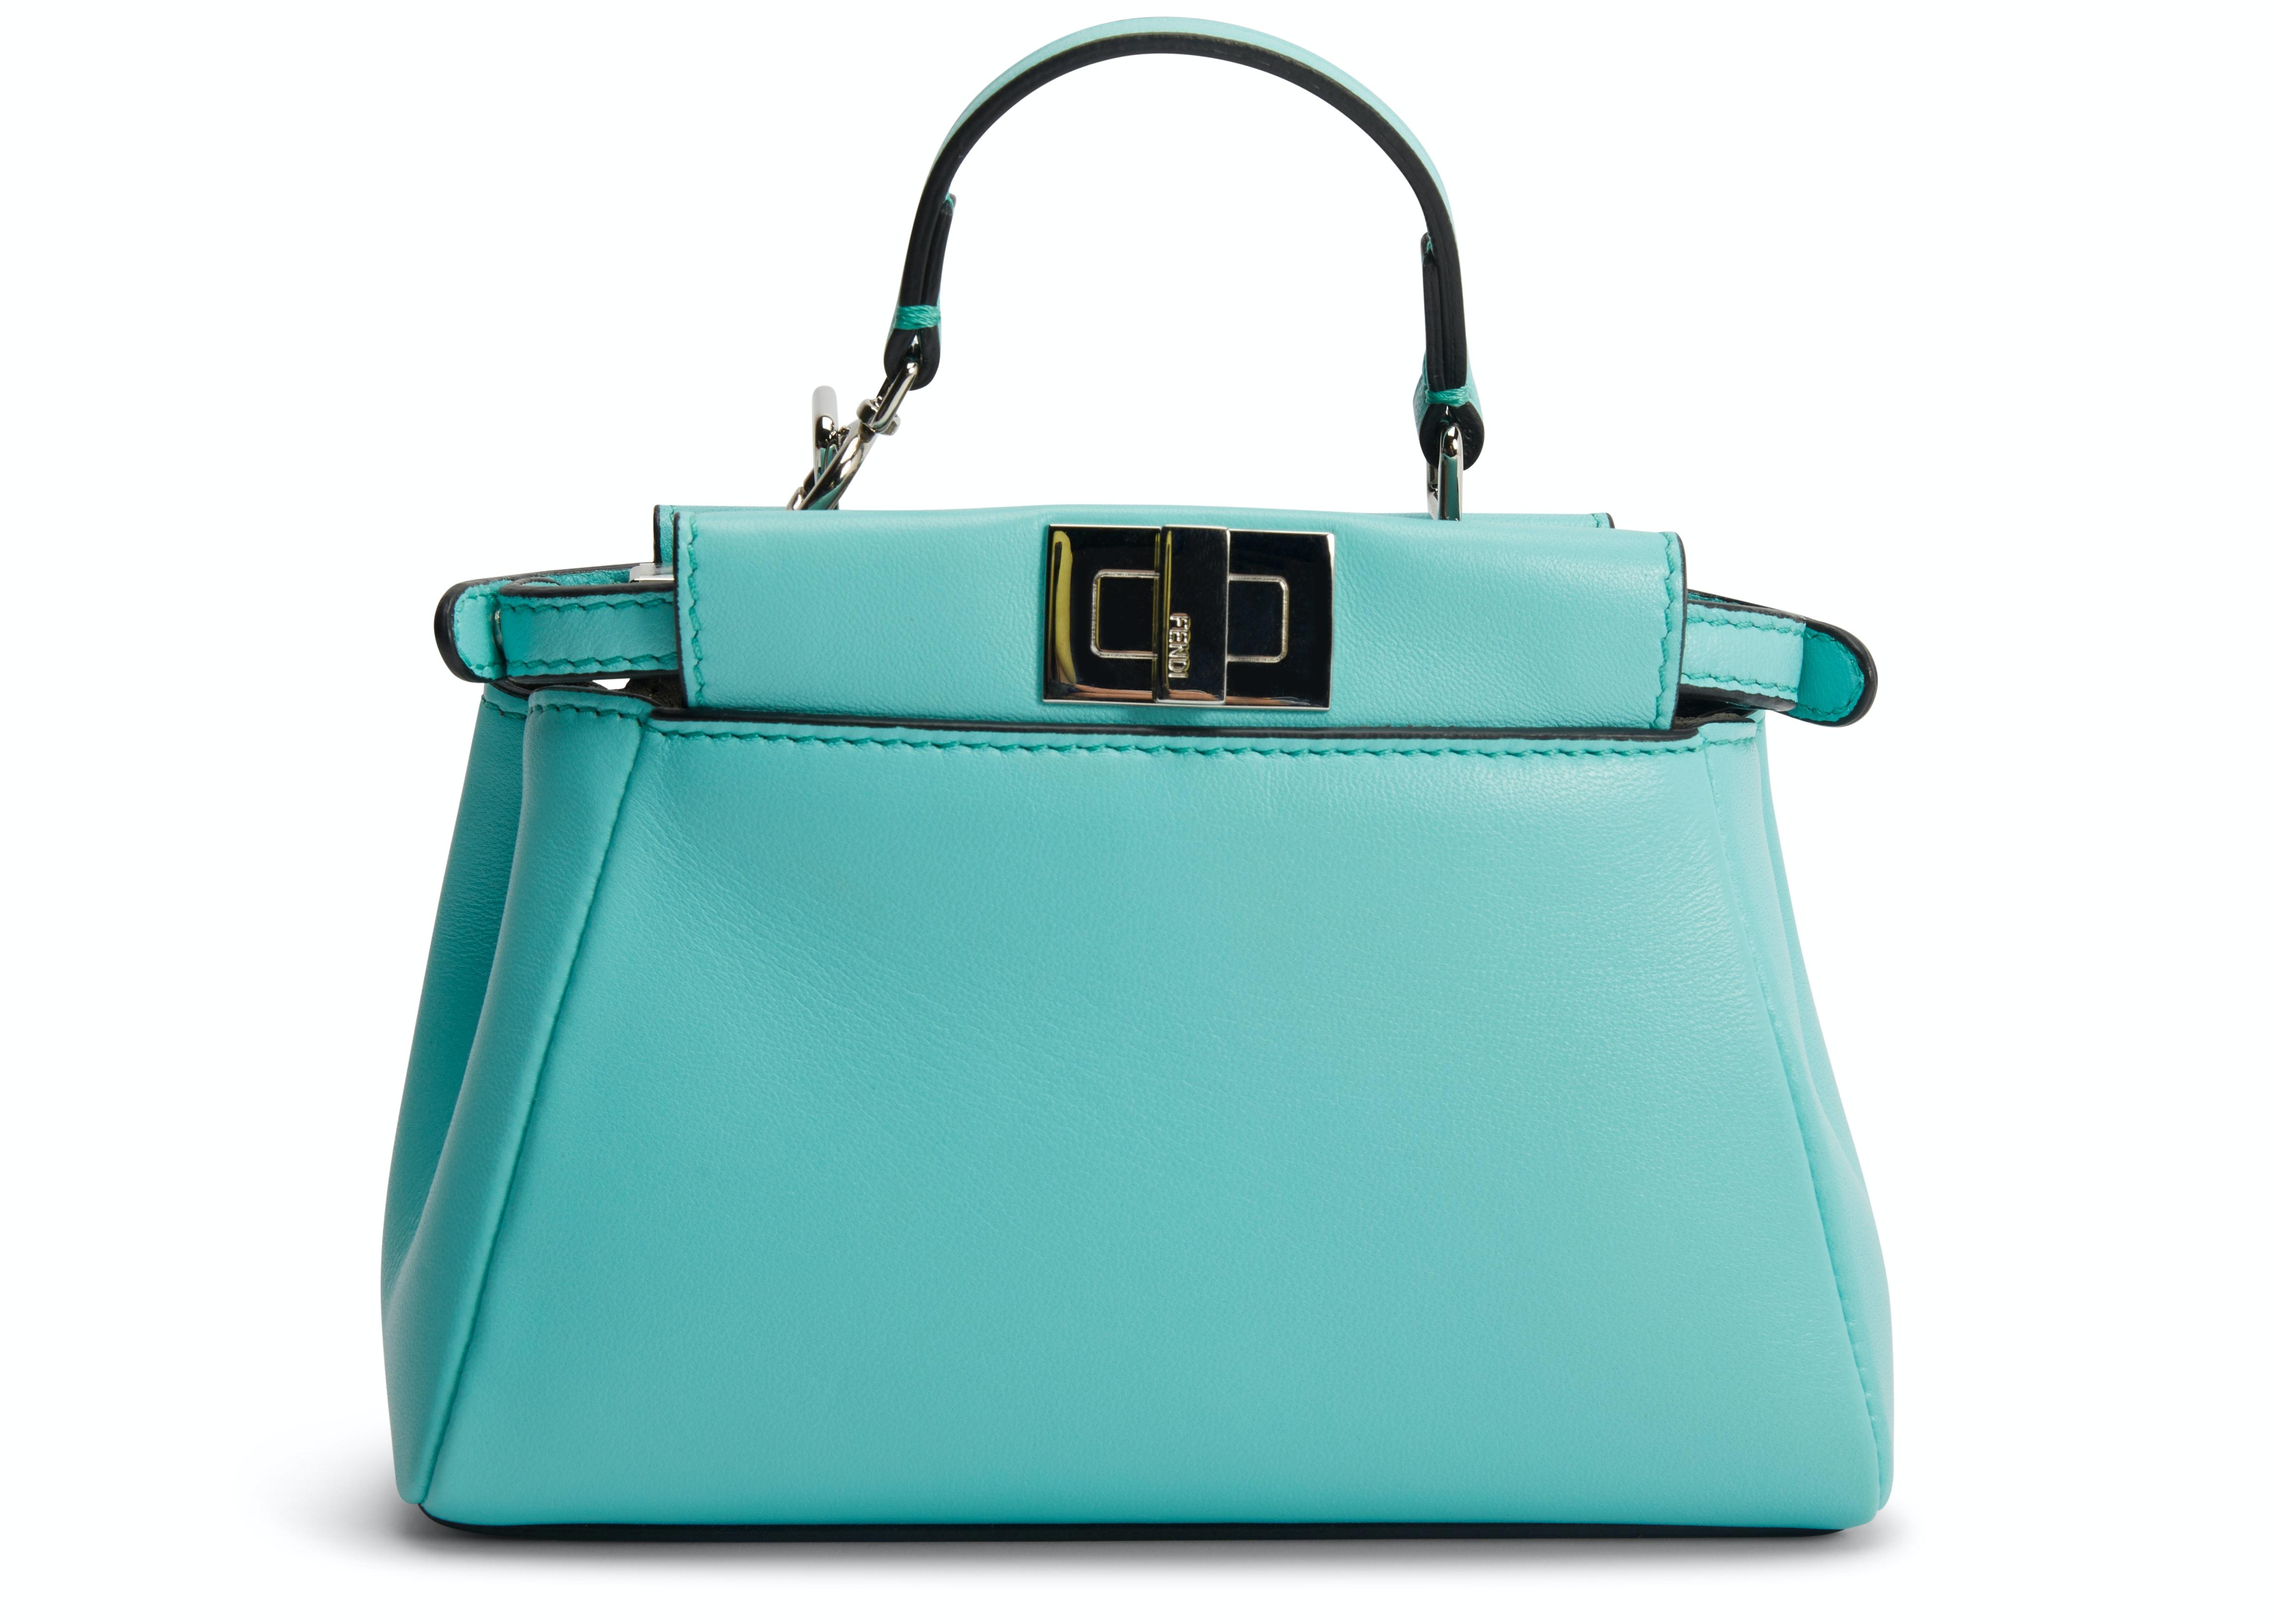 Fendi Peekaboo Micro Turquoise